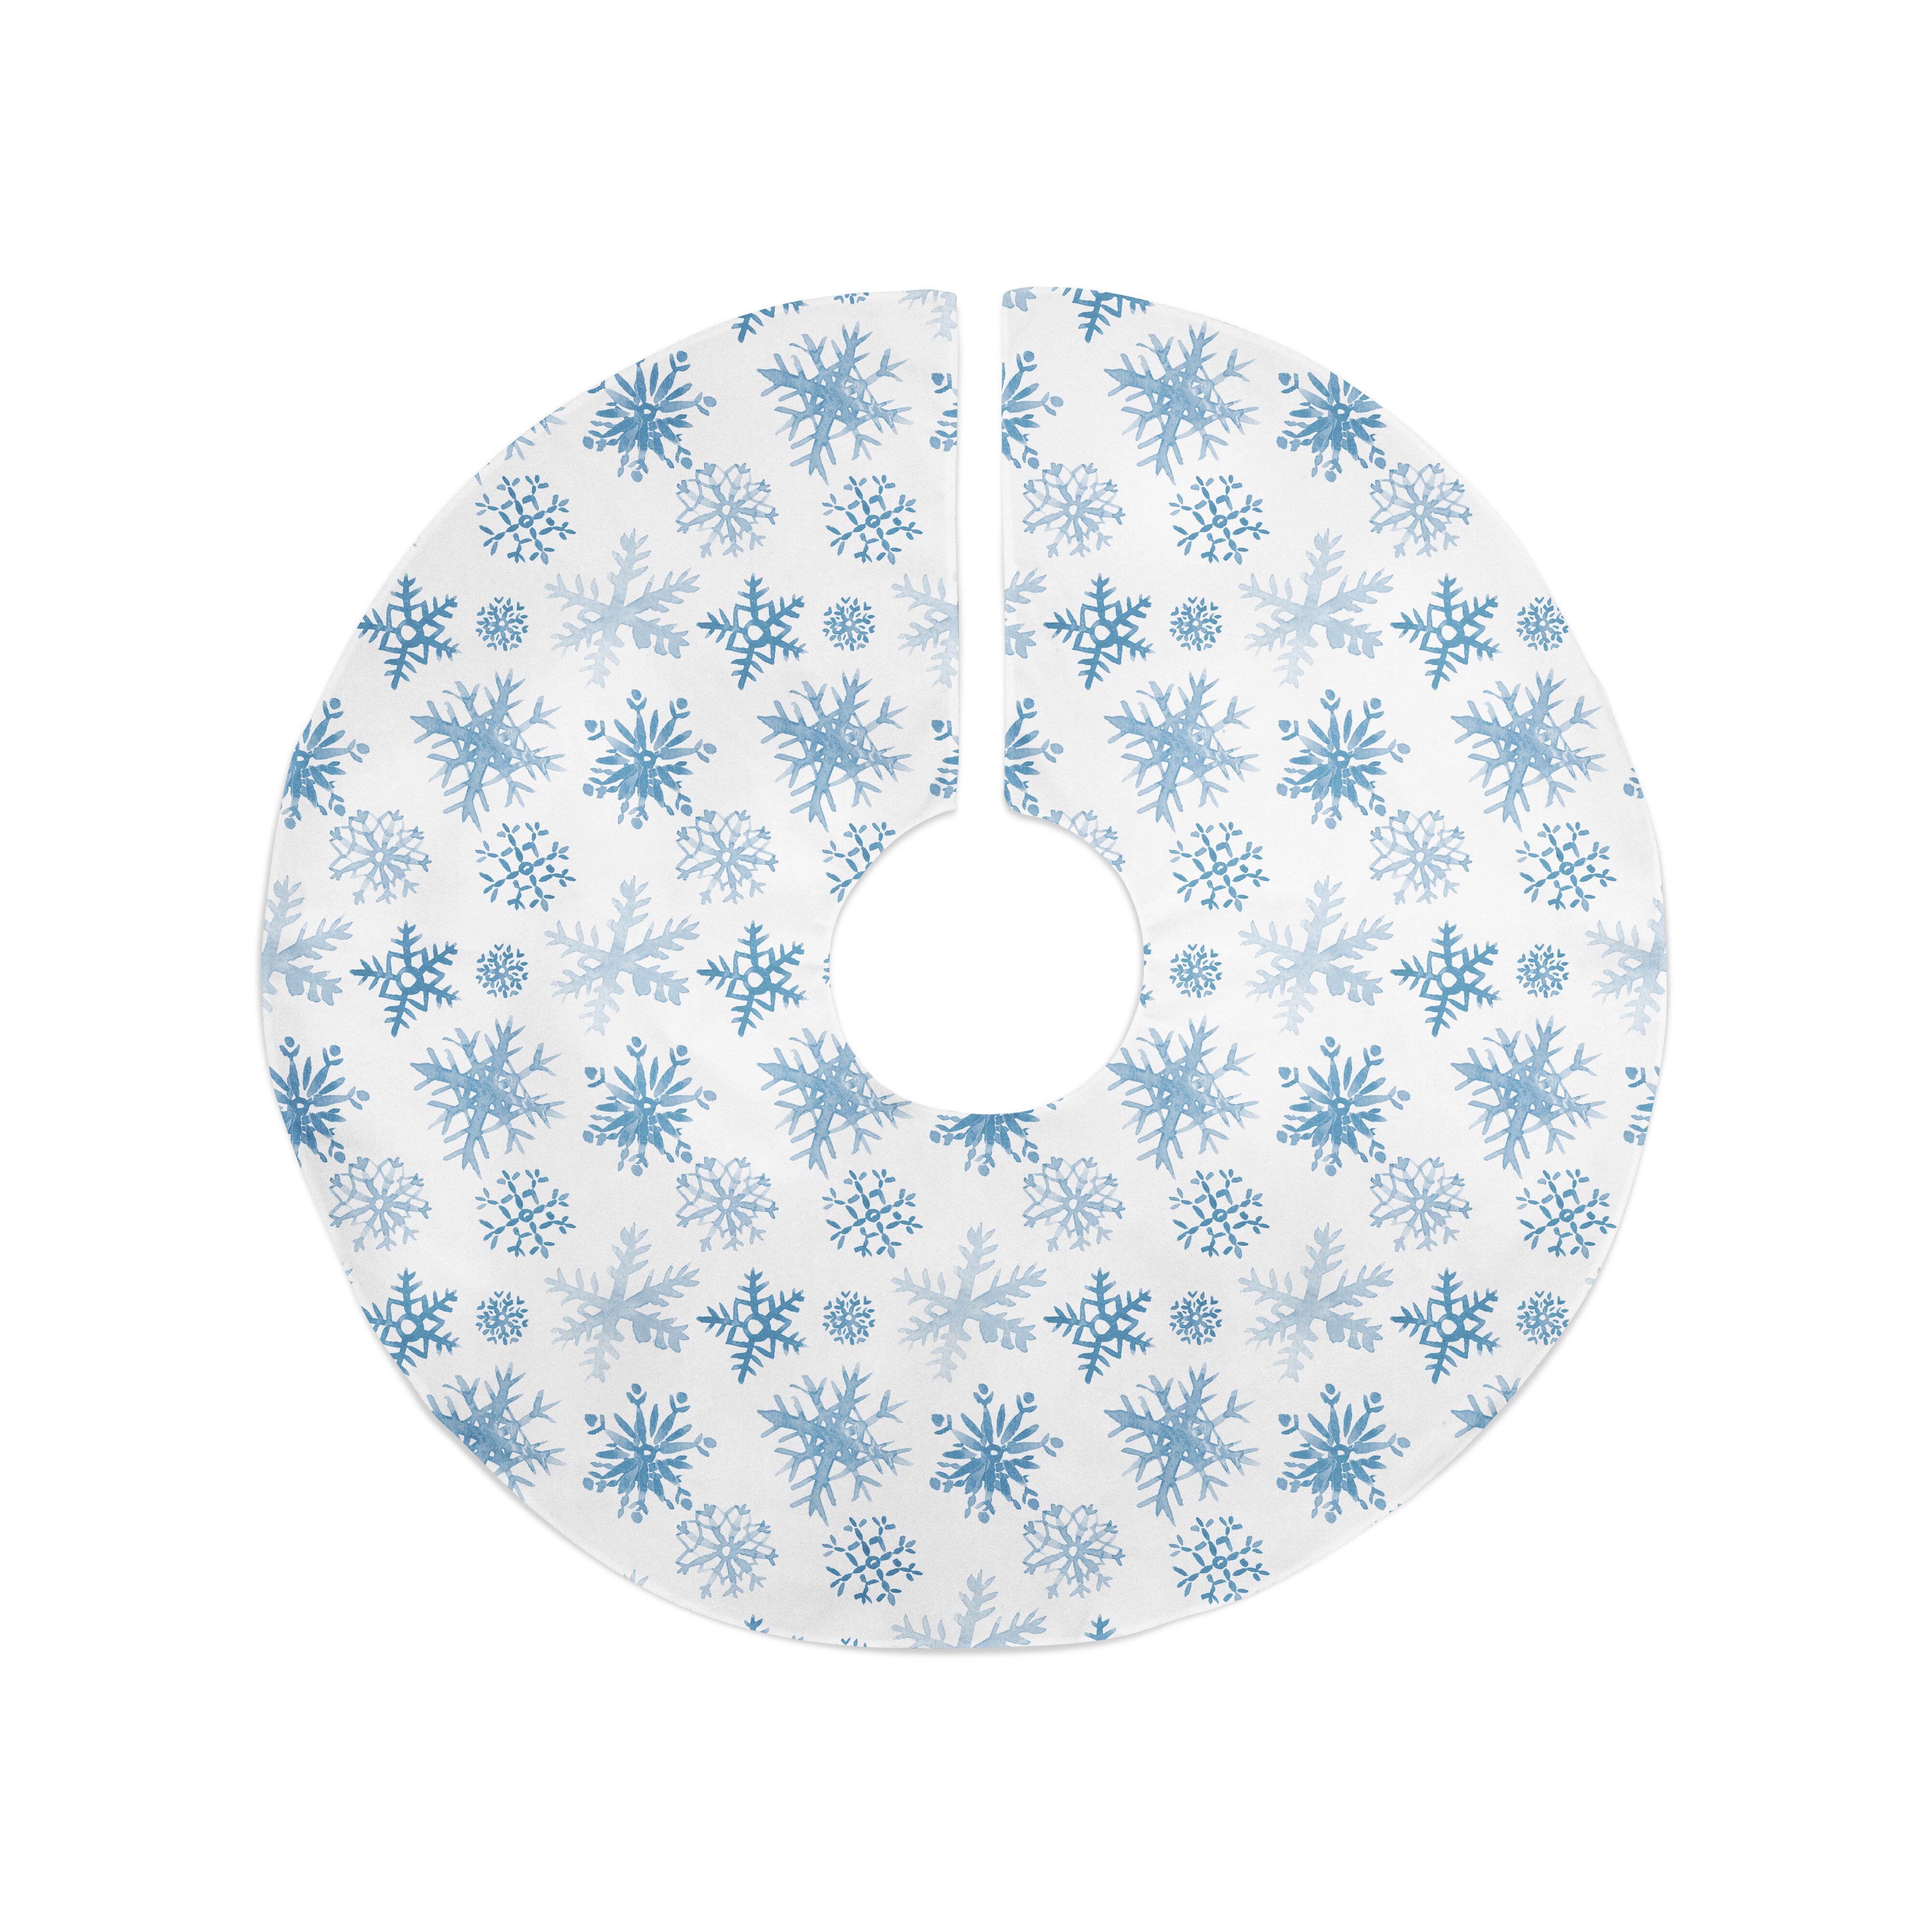 Blue Christmas Tree Skirts Collars You Ll Love In 2021 Wayfair